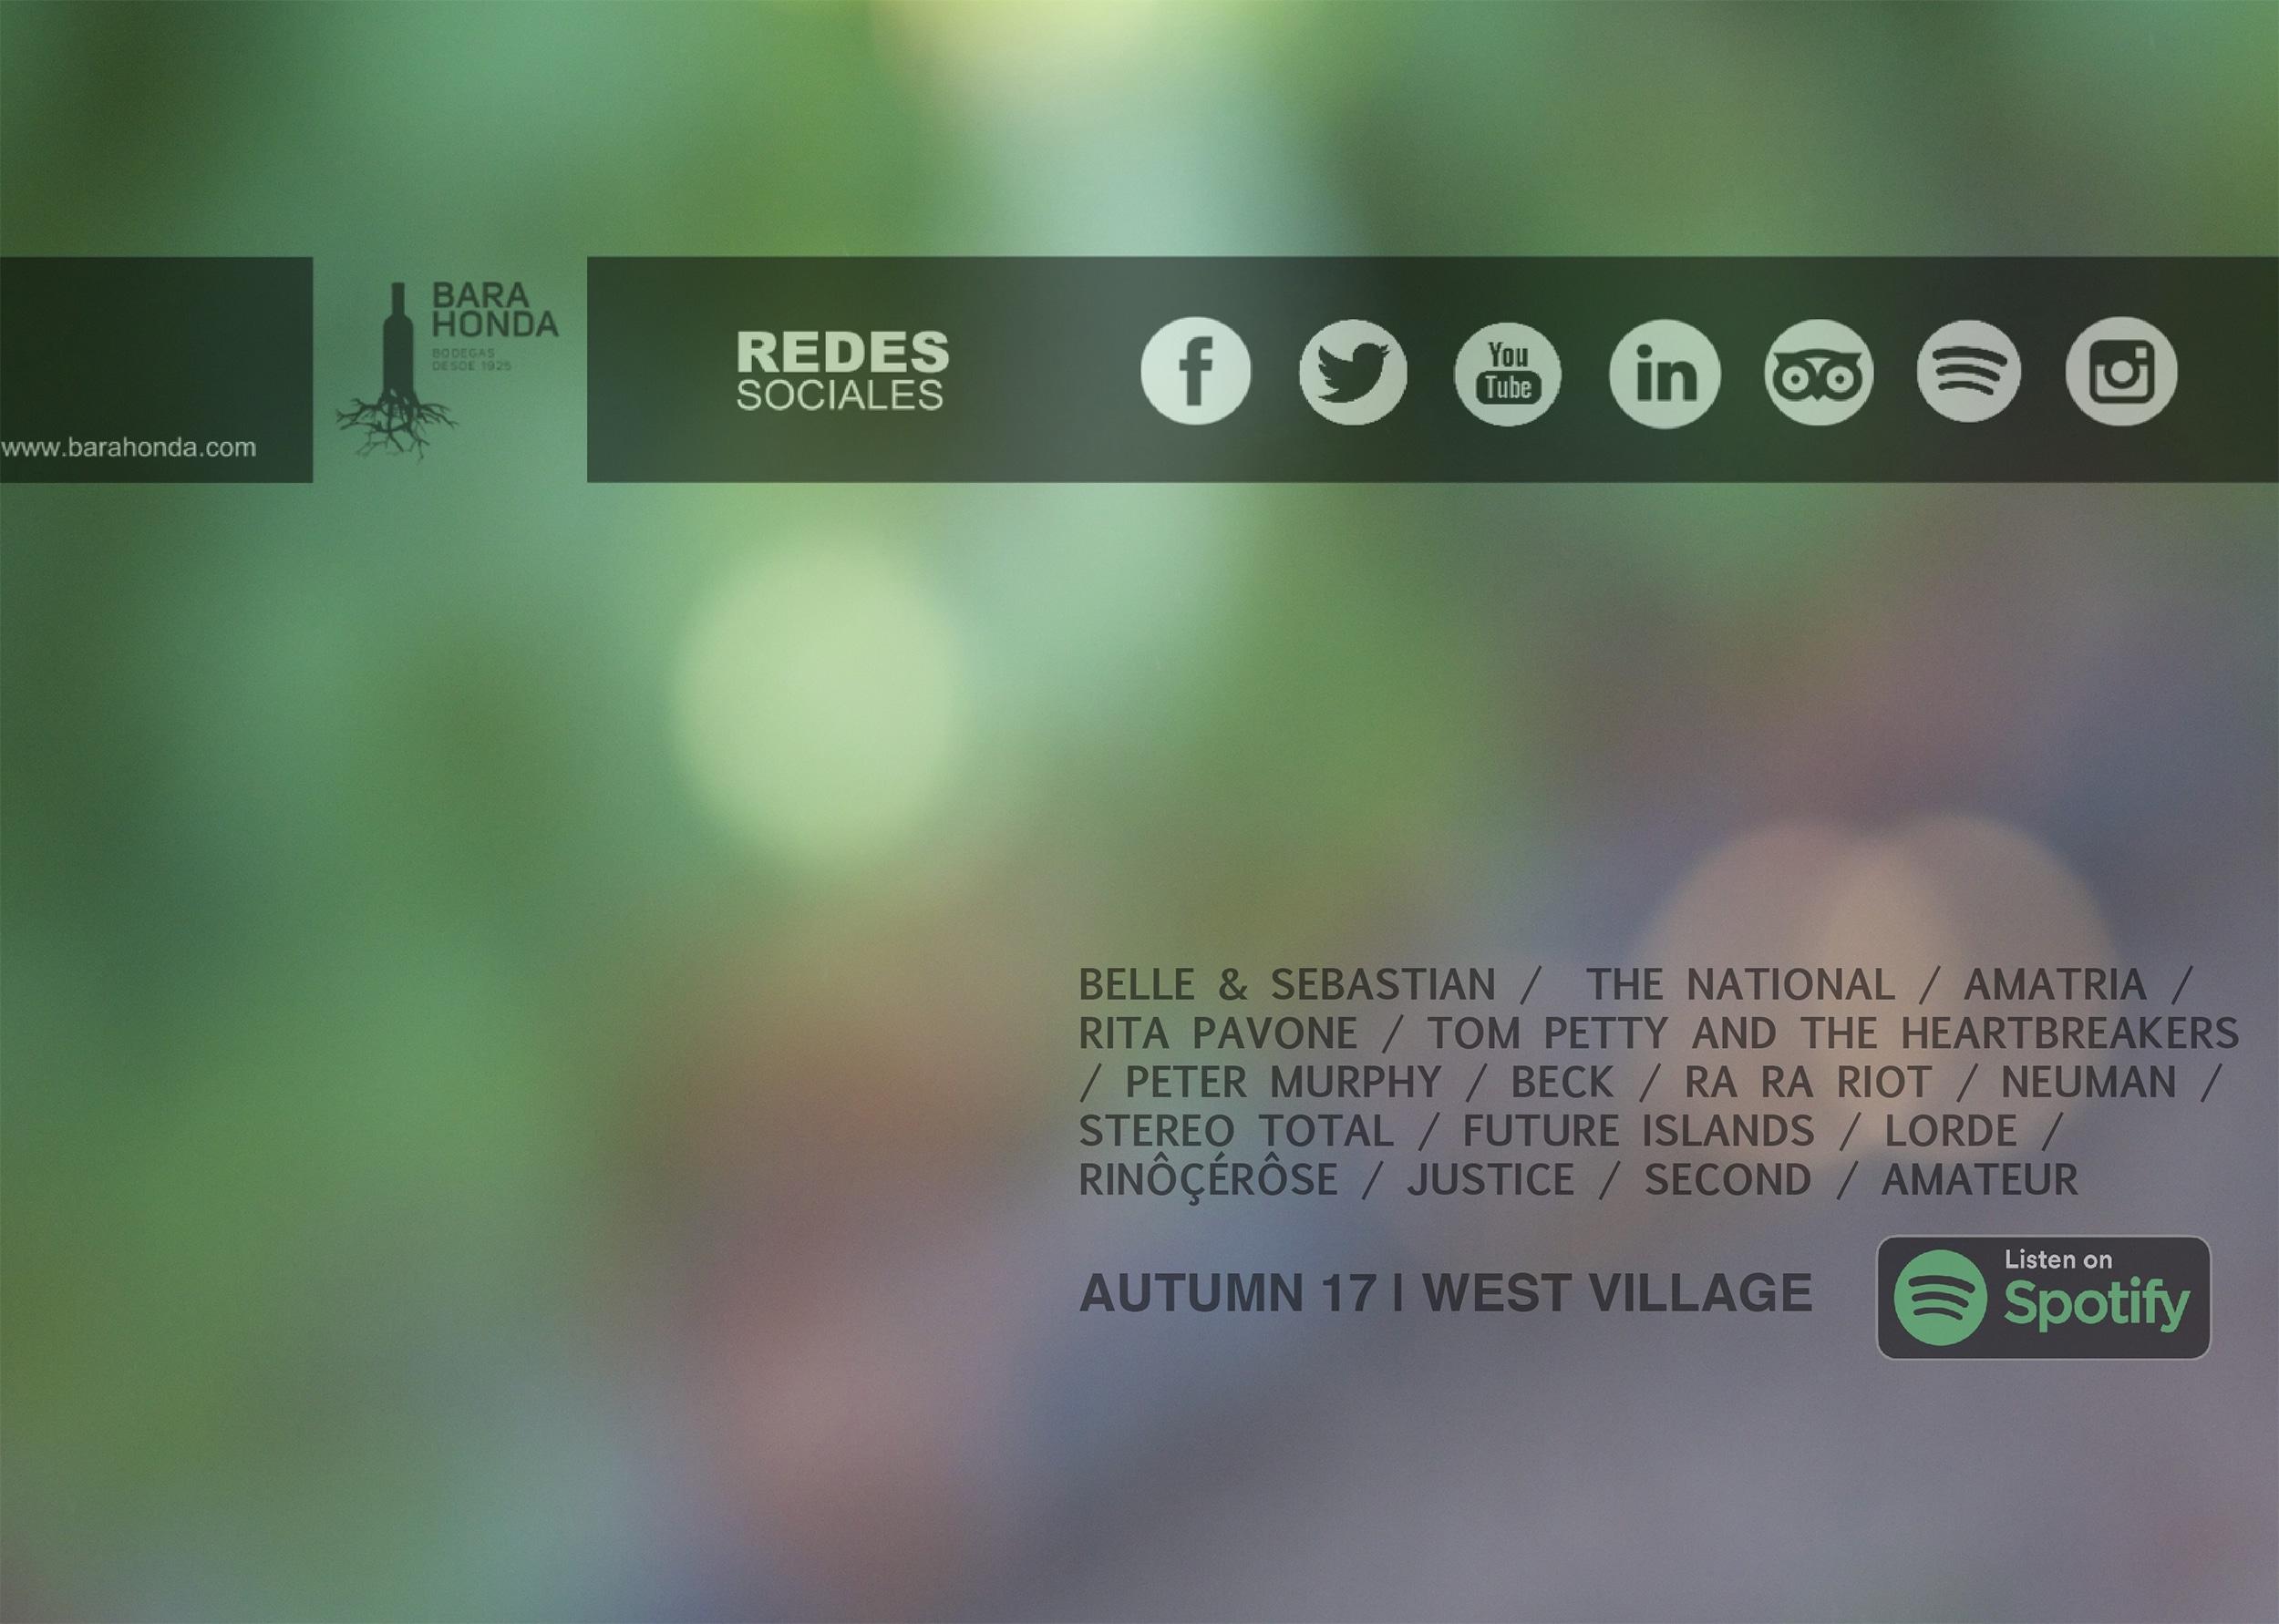 Playlist Spotify: Autumn 17 | West Village